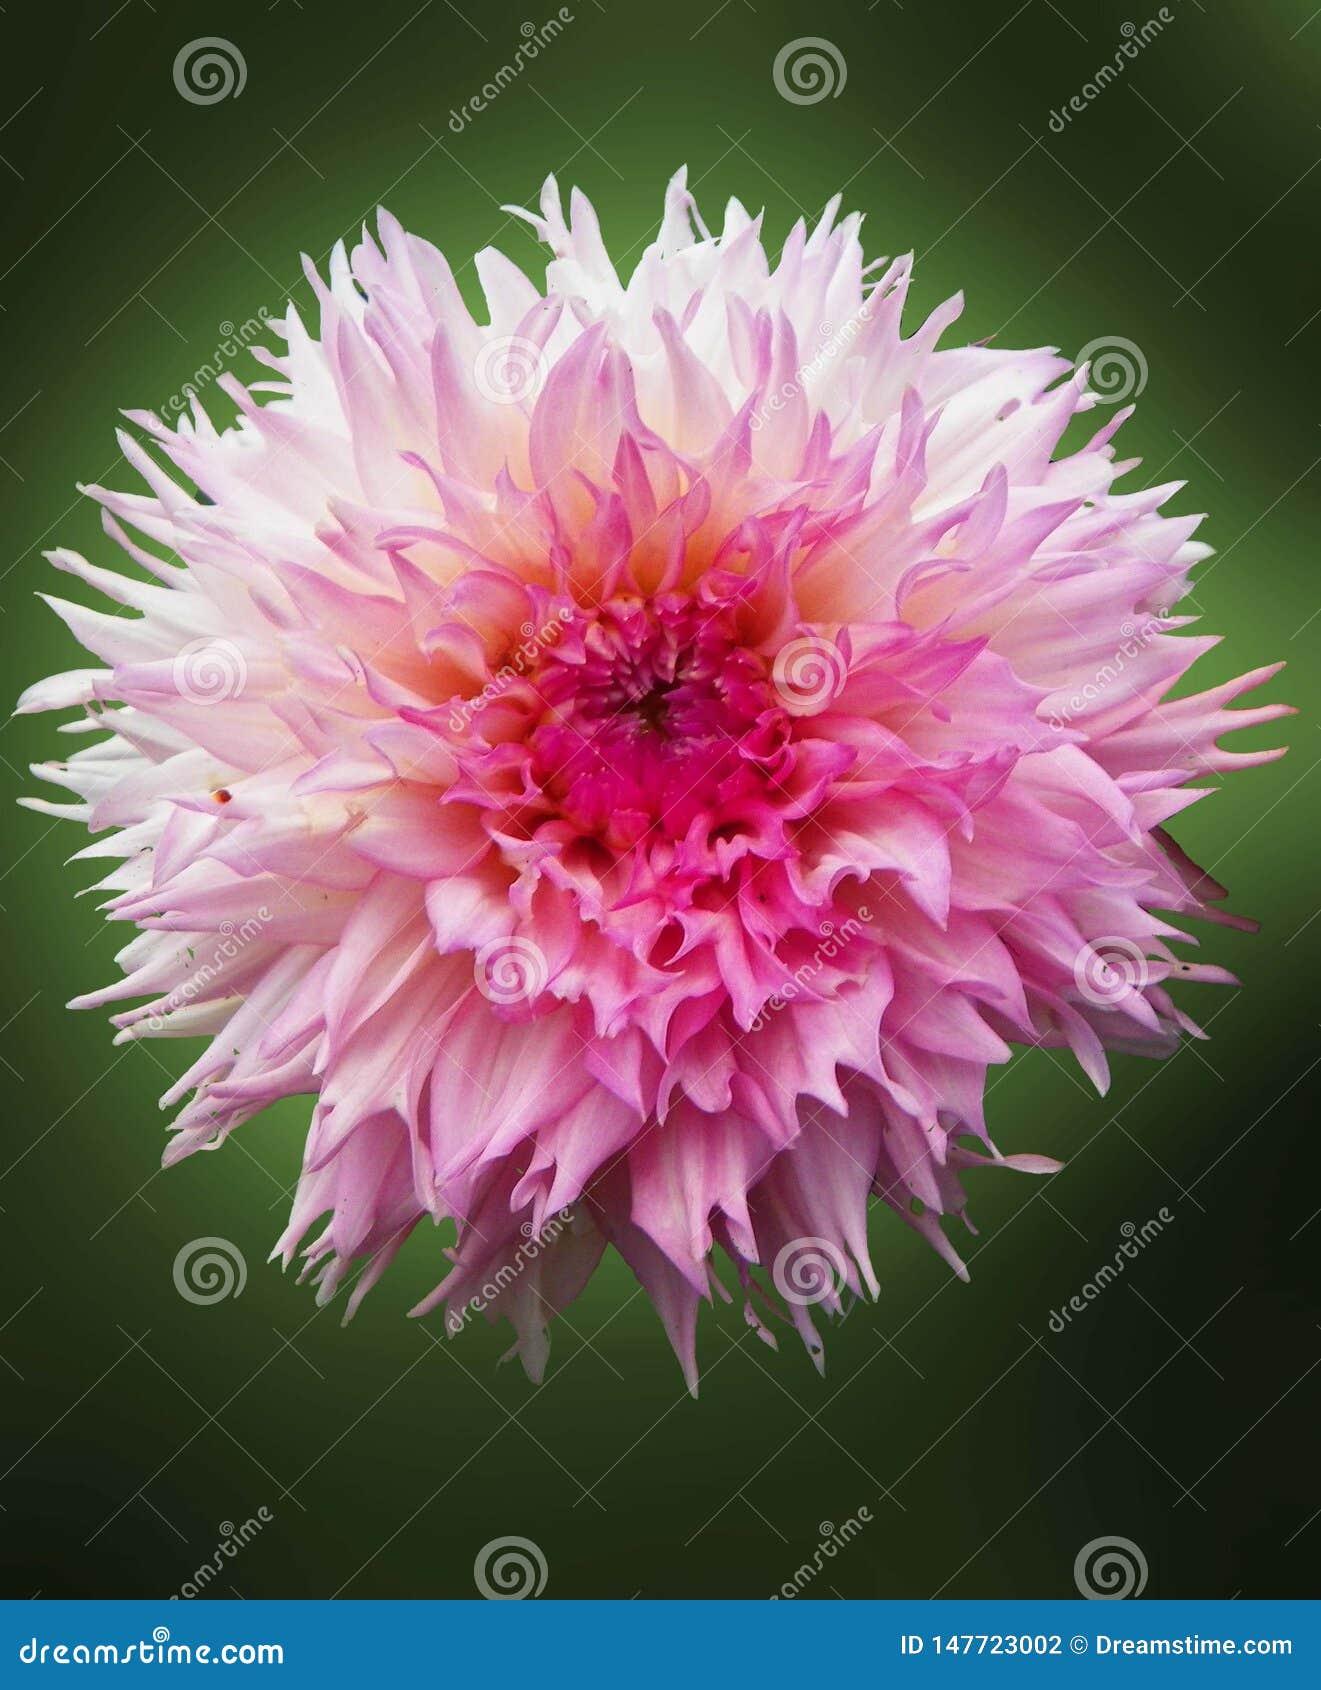 Цветок георгина на зеленой предпосылке